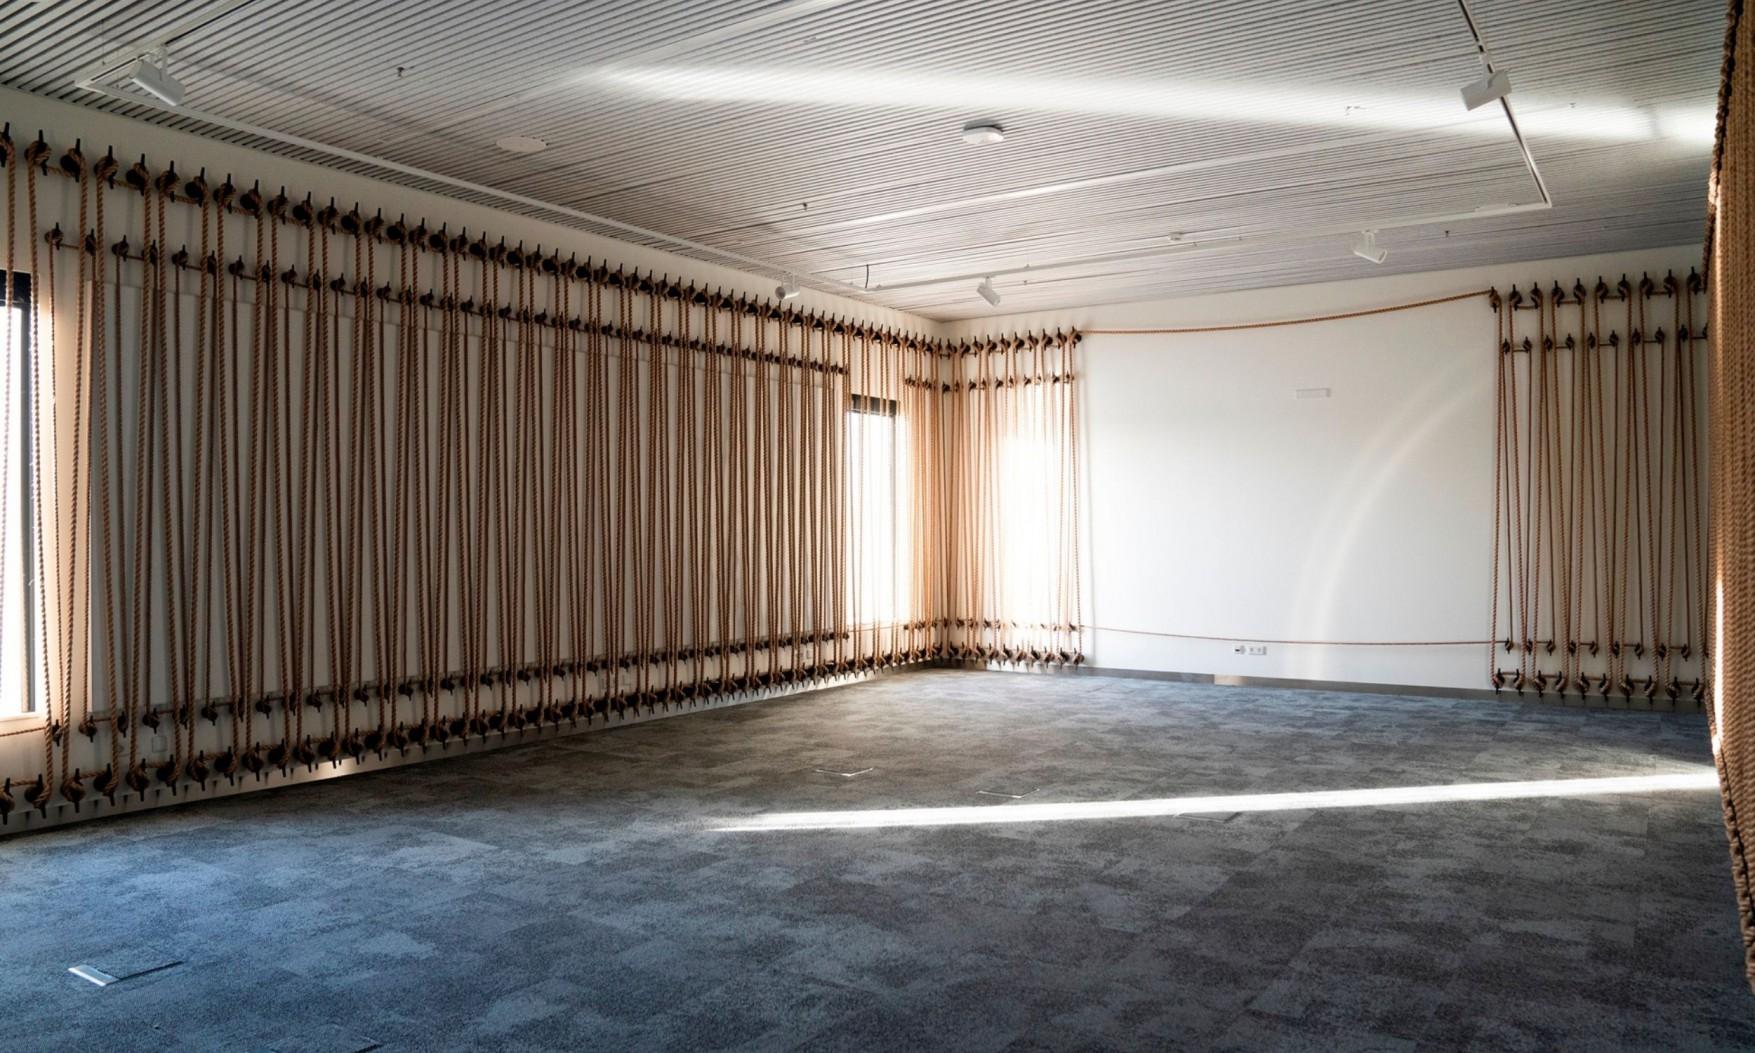 Harryvan Interieurbouw | specials plafond- en wandbekleding AHOY Rotterdam © Anja Tuinder - fotostudio Eye 4 You